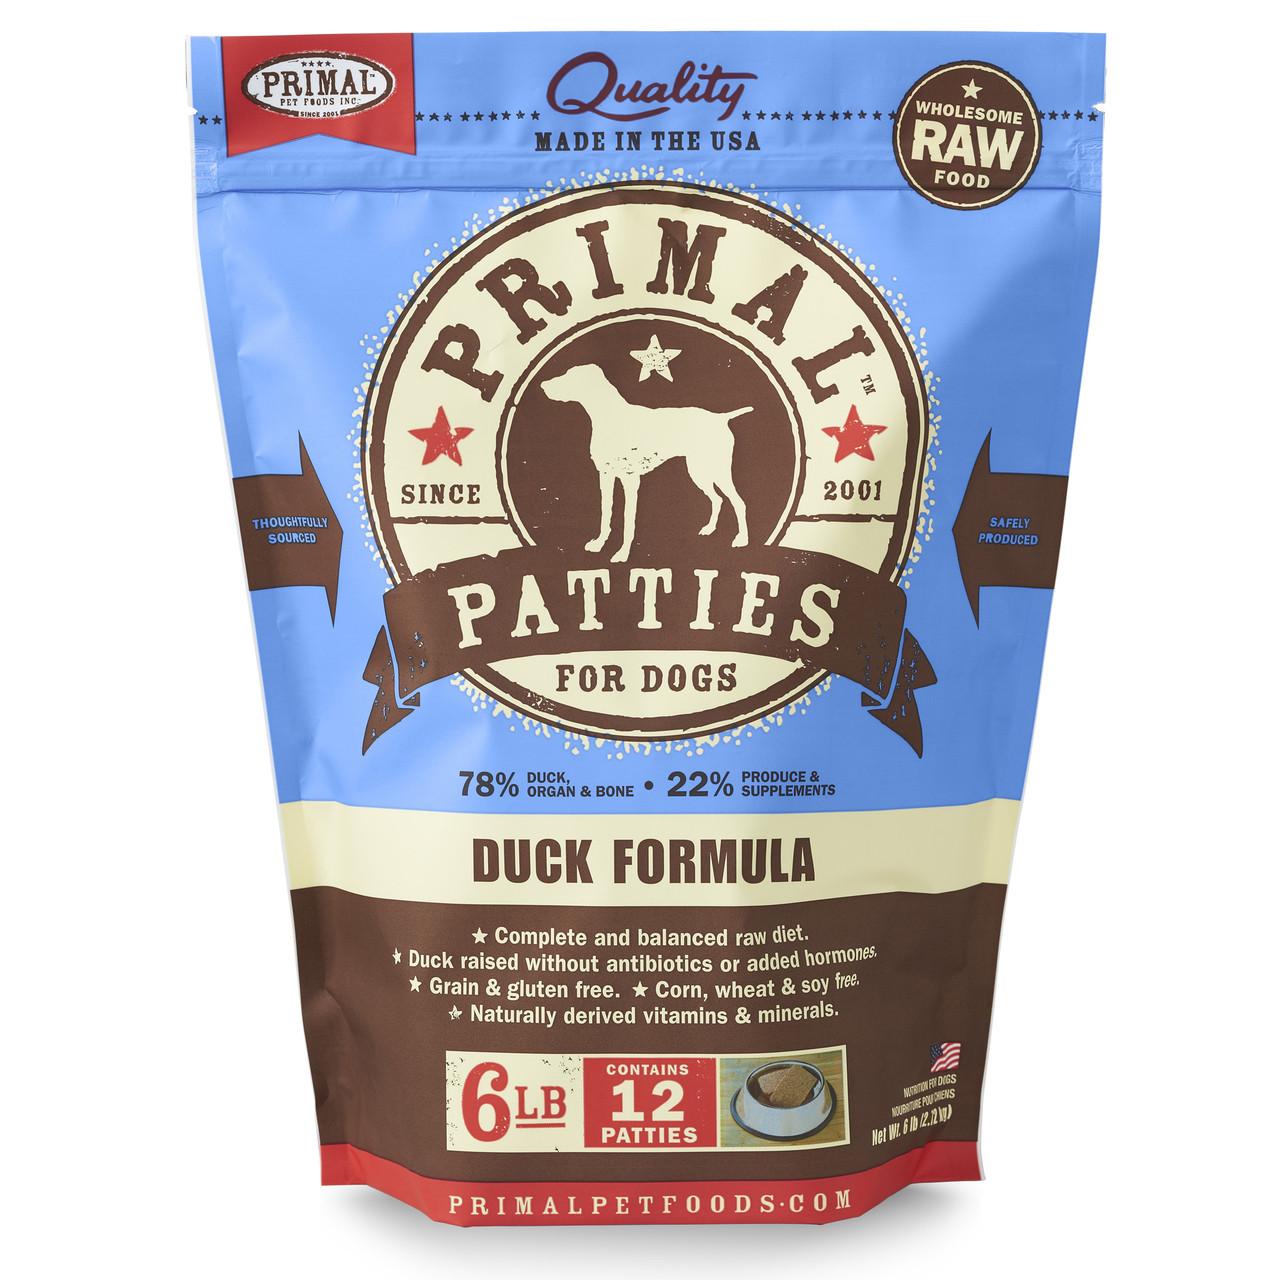 Primal Raw Frozen Canine Patties Duck Formula Dog Food